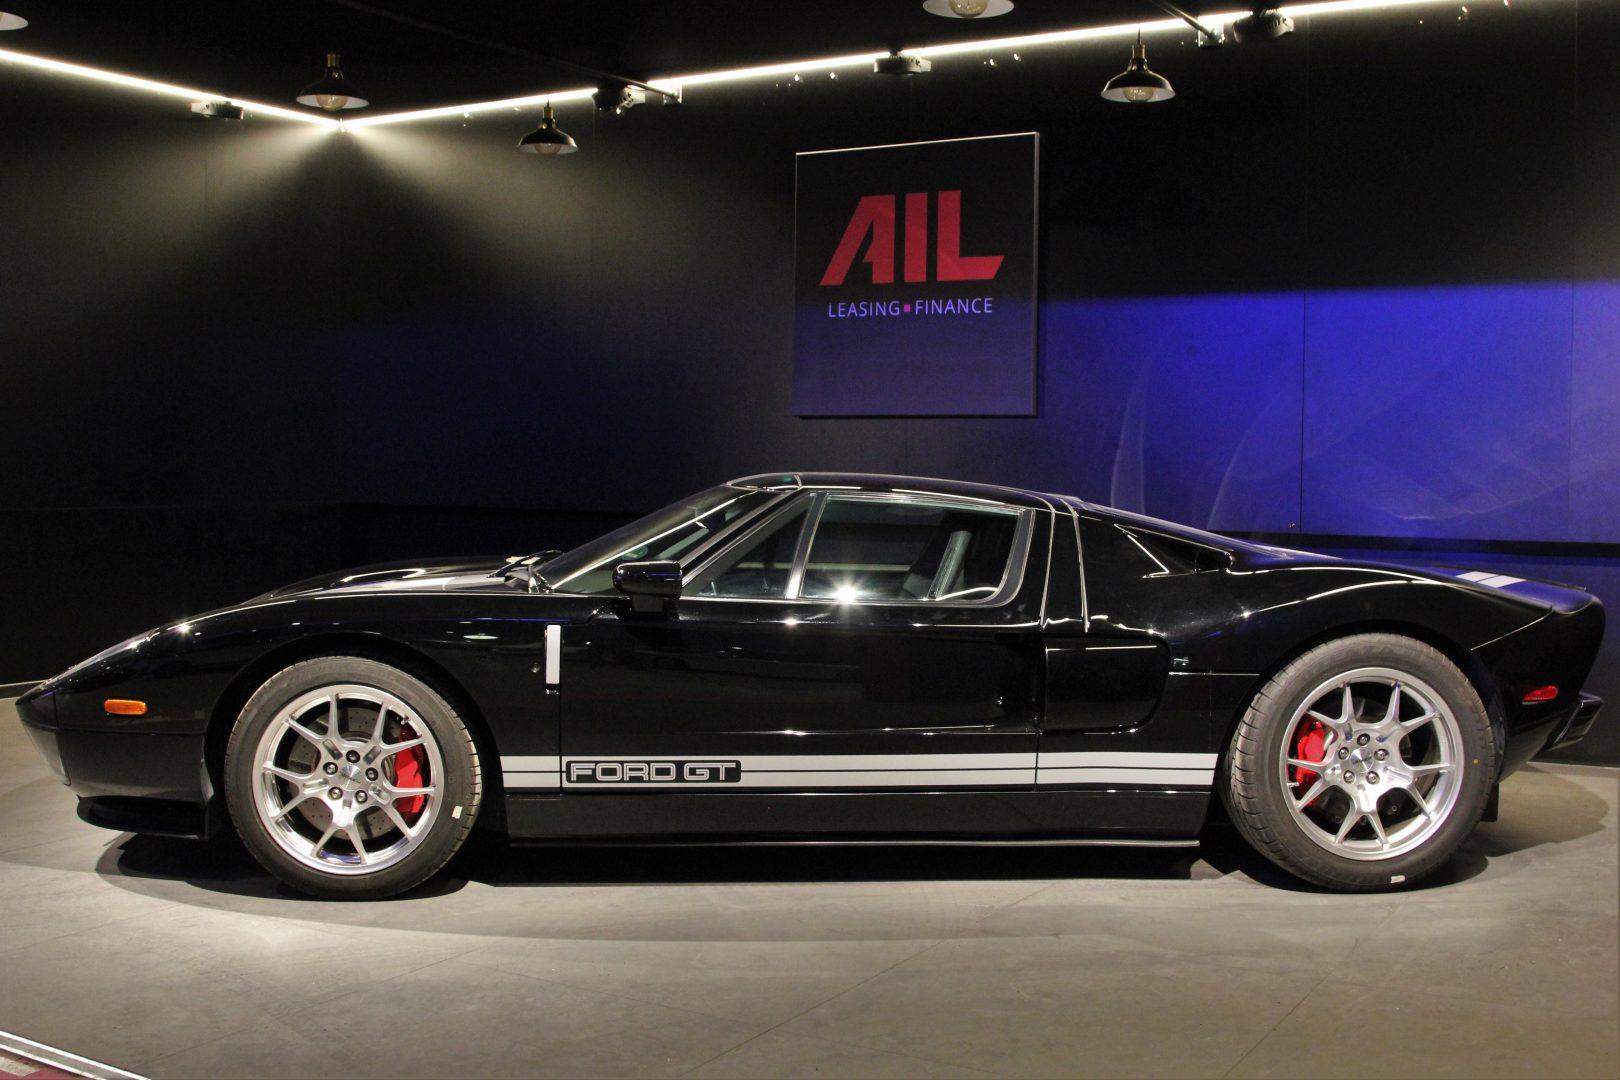 AIL Ford GT 5.4L V8 Supercharger 10